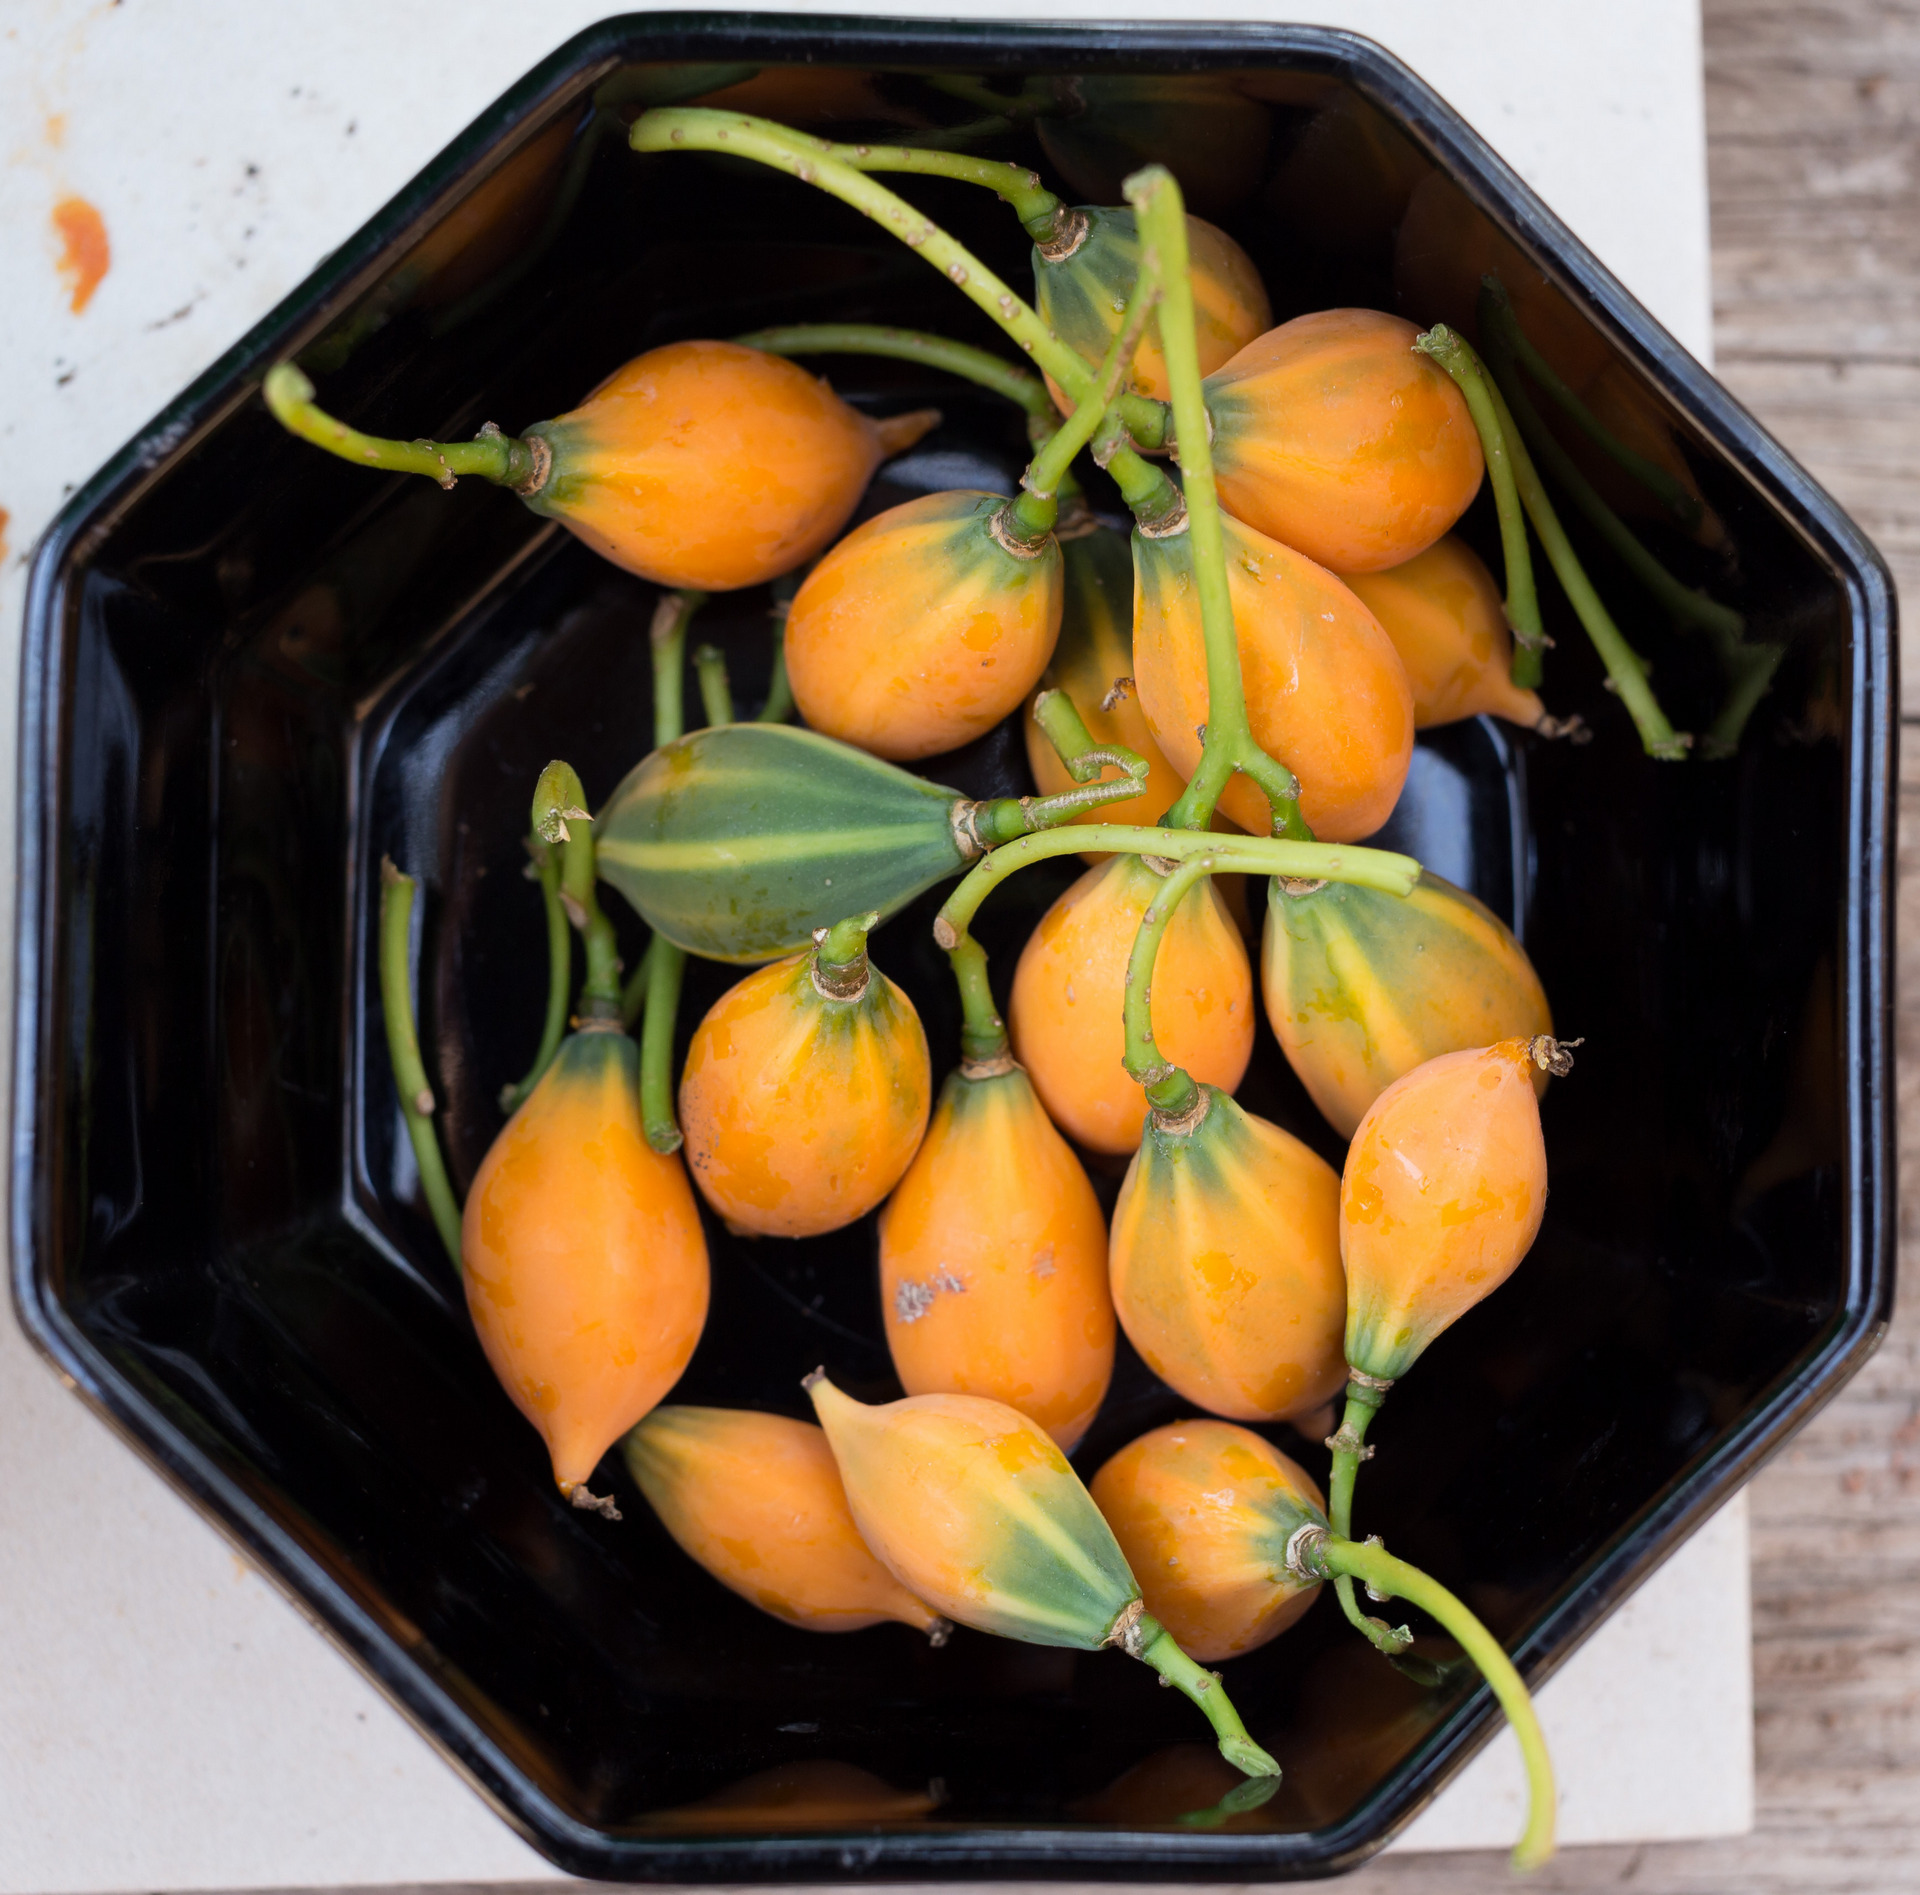 canary exotic fruits la palma canary ionescu vlad